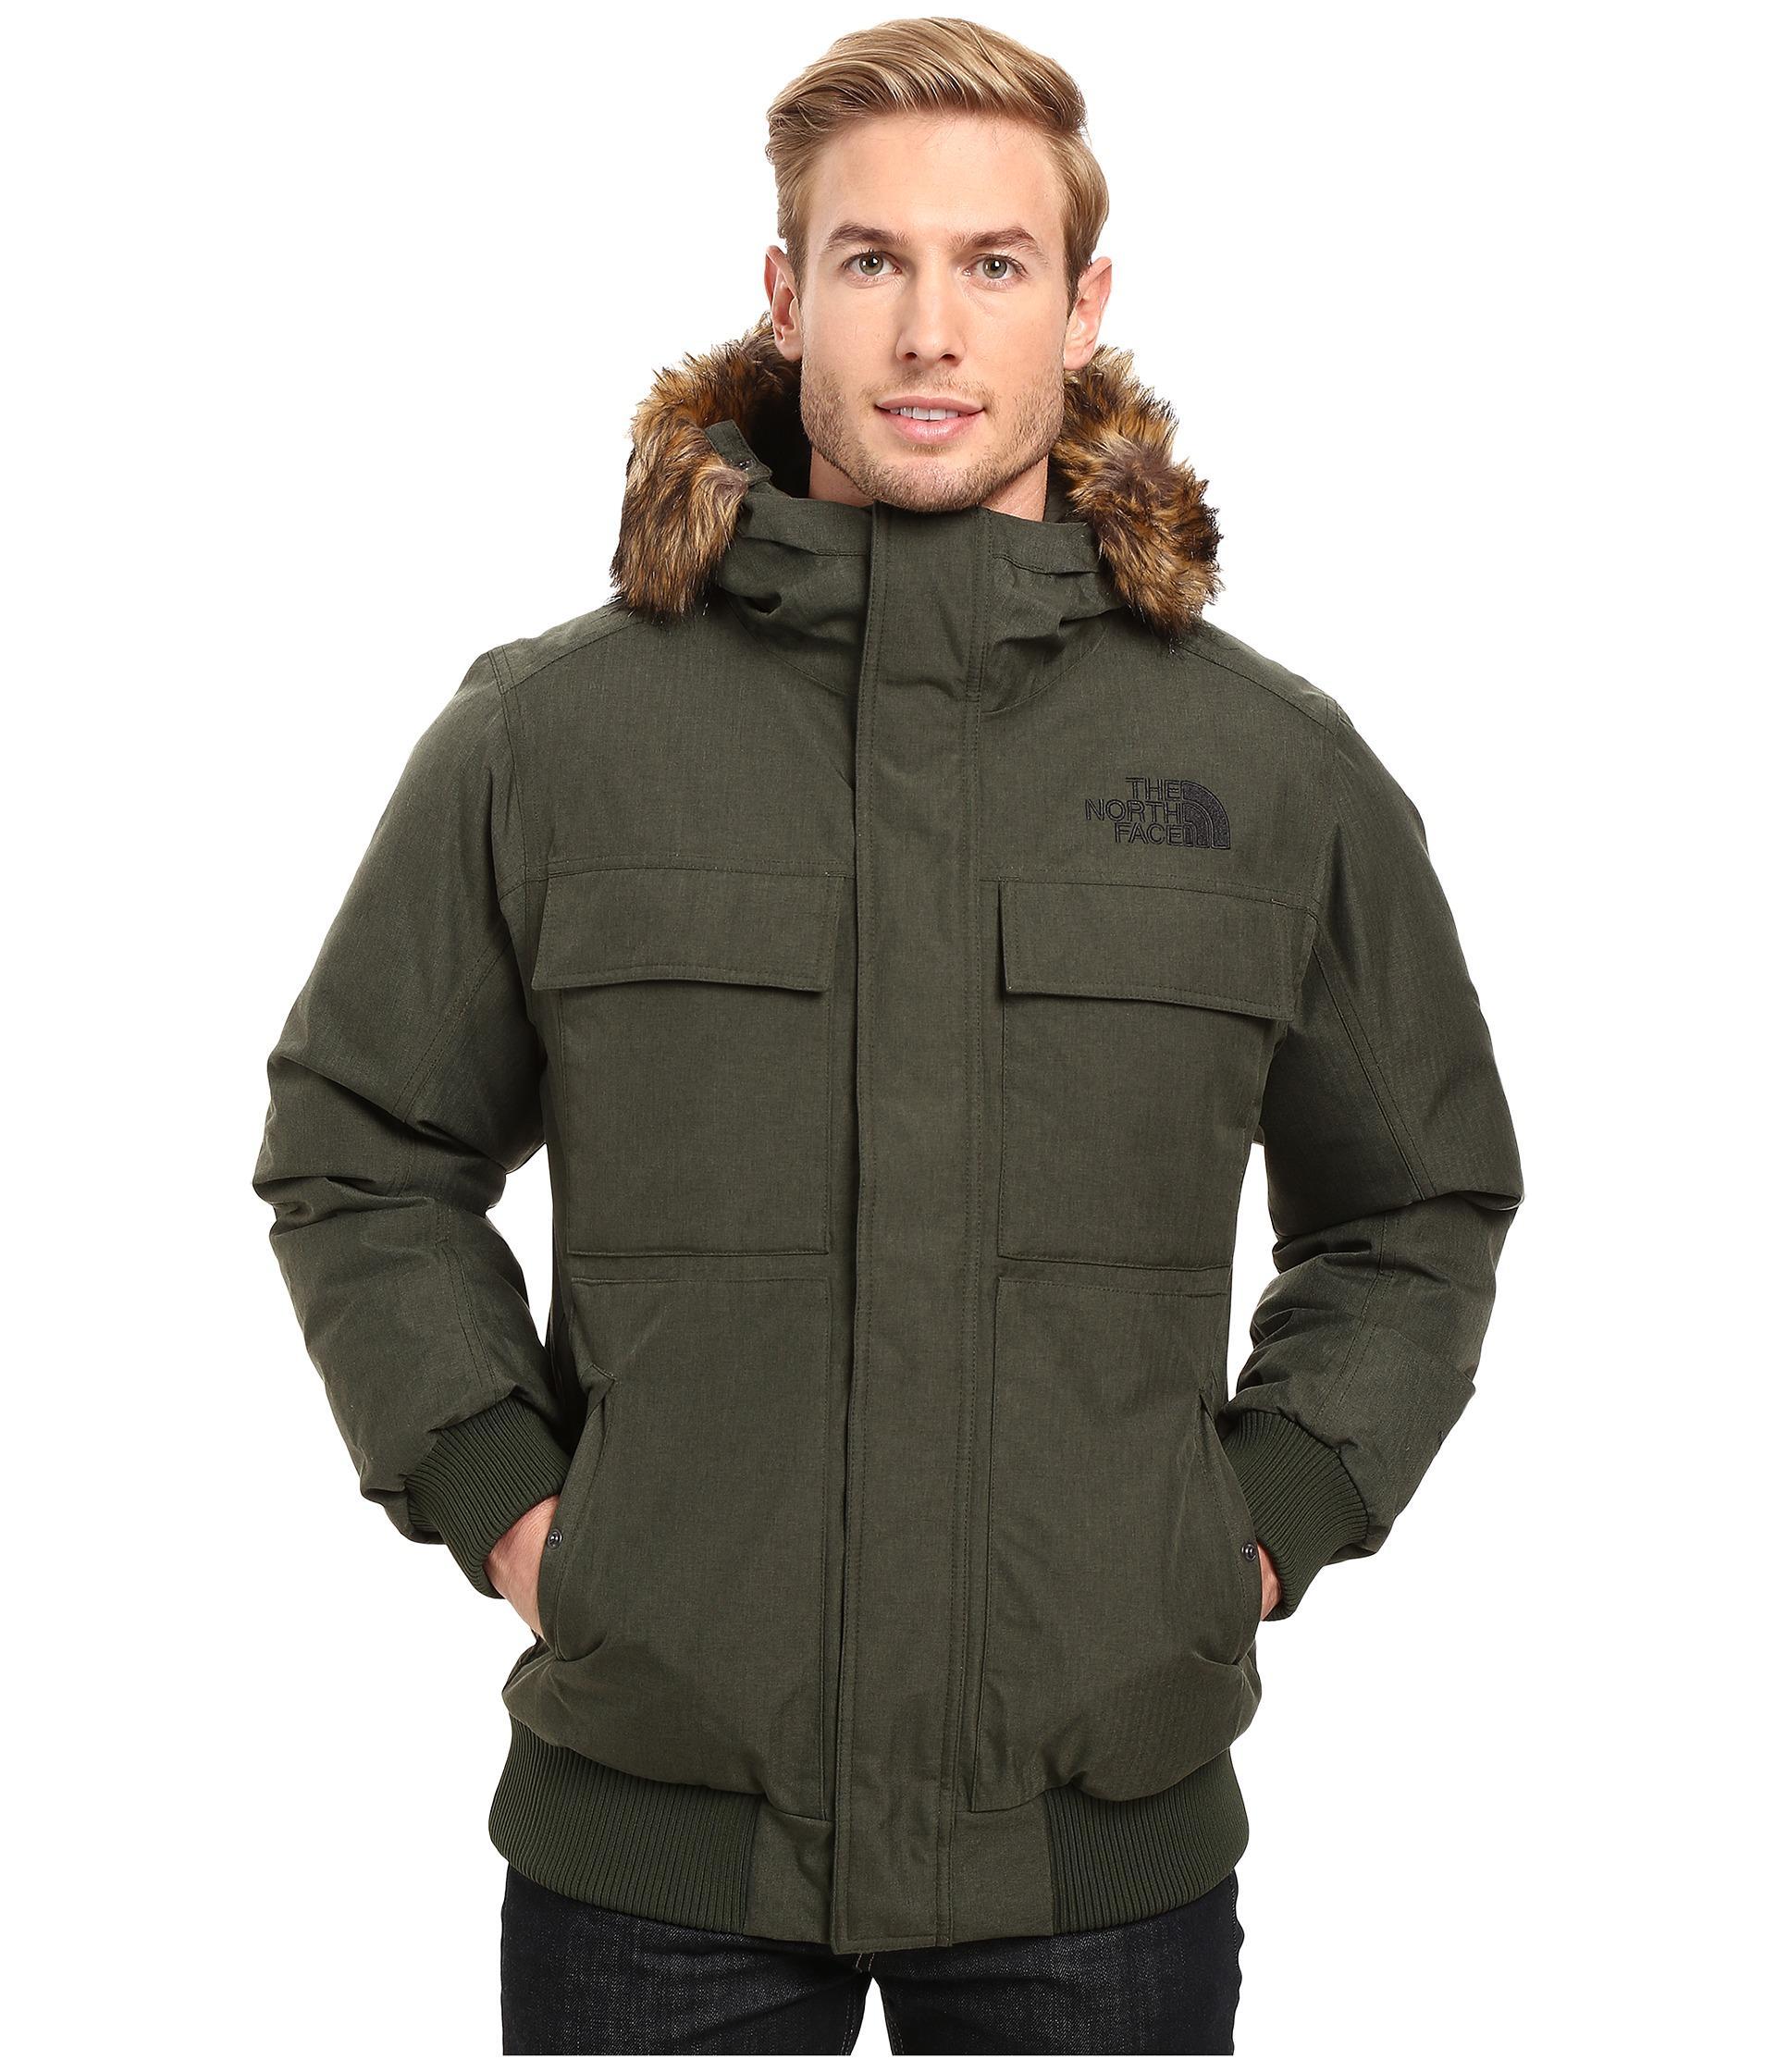 01170081c discount code for north face mens gotham jacket 2 af272 140ac